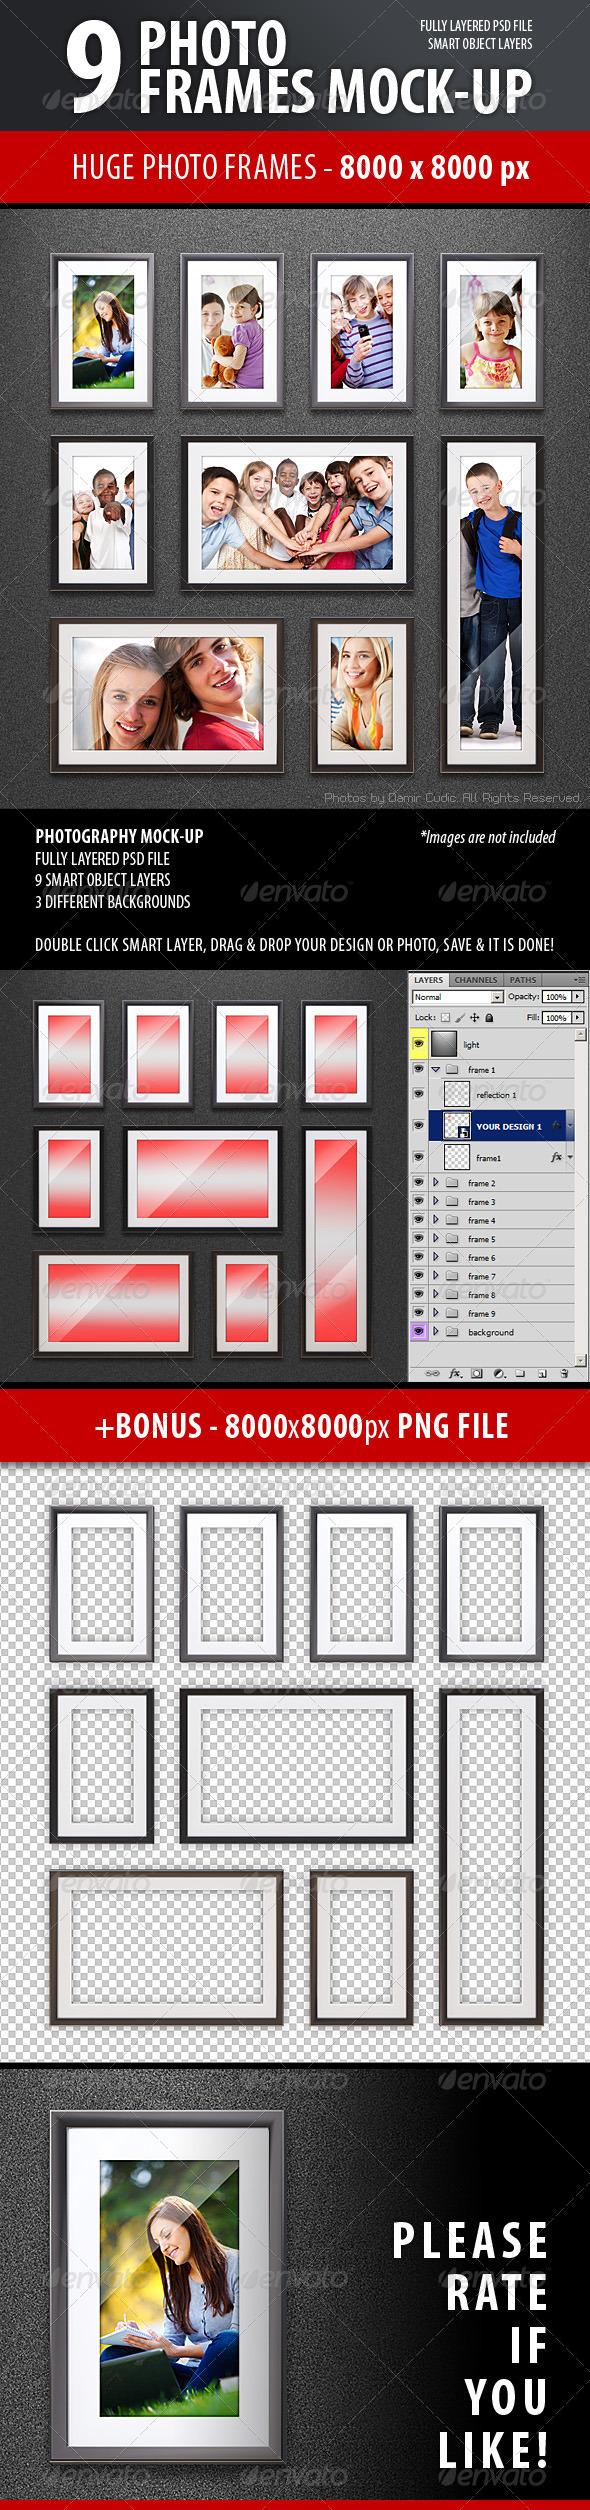 Photo Frames Mock-up - Photo Templates Graphics